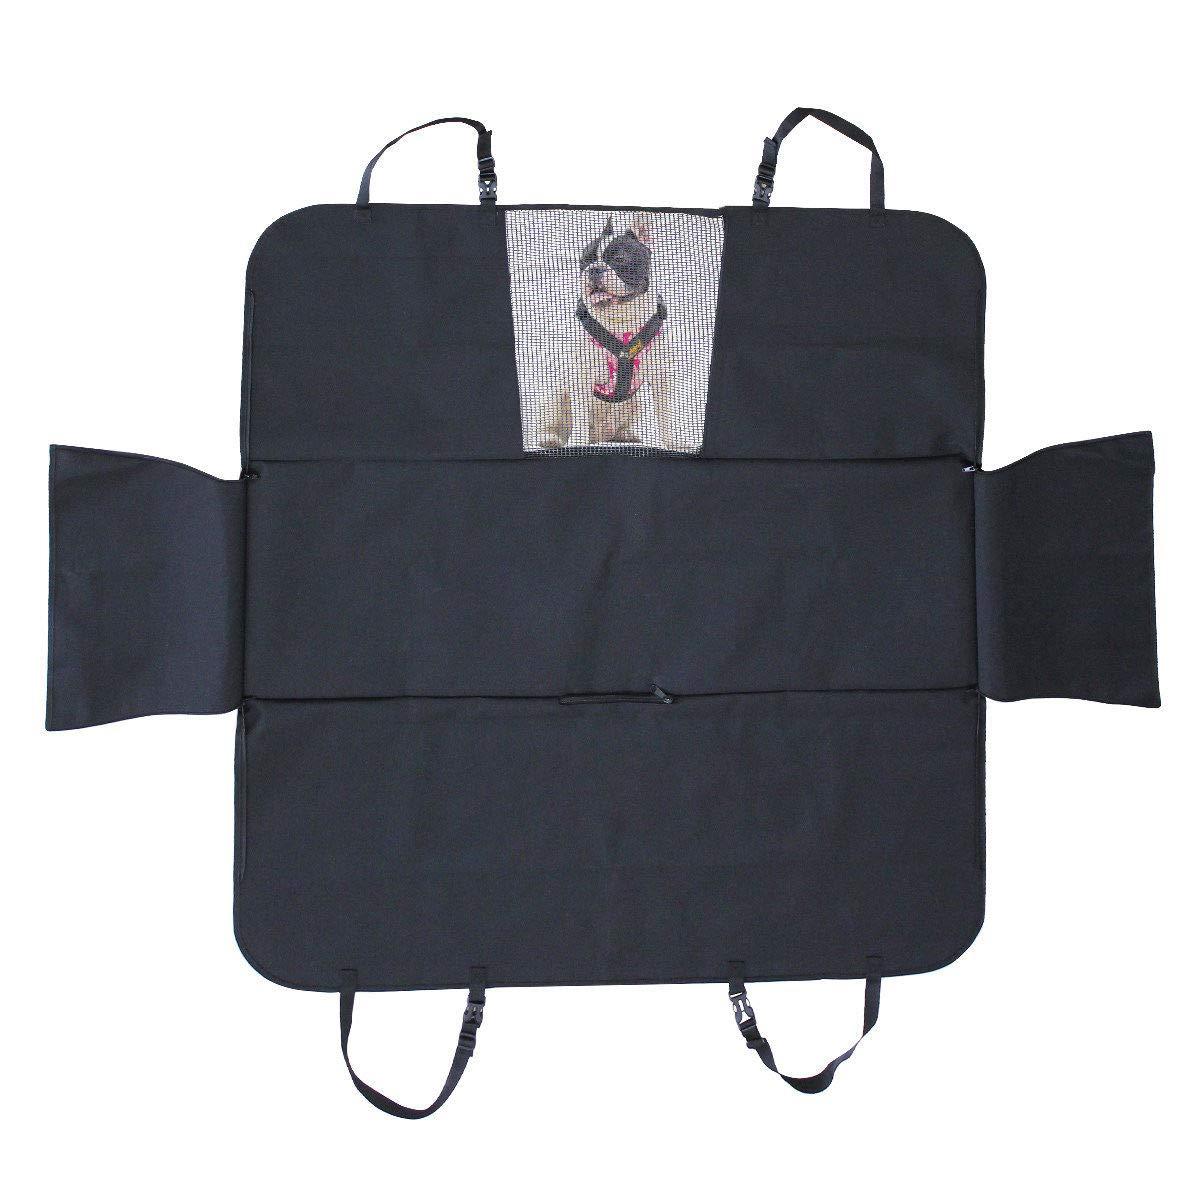 Black Original Pet Seat Cover for Cars. Water Resistant, Non Slip, Durable, Soft Backseat Hammock,Durable Pet Seat Covers for Cars Trucks and SUVs (Black)